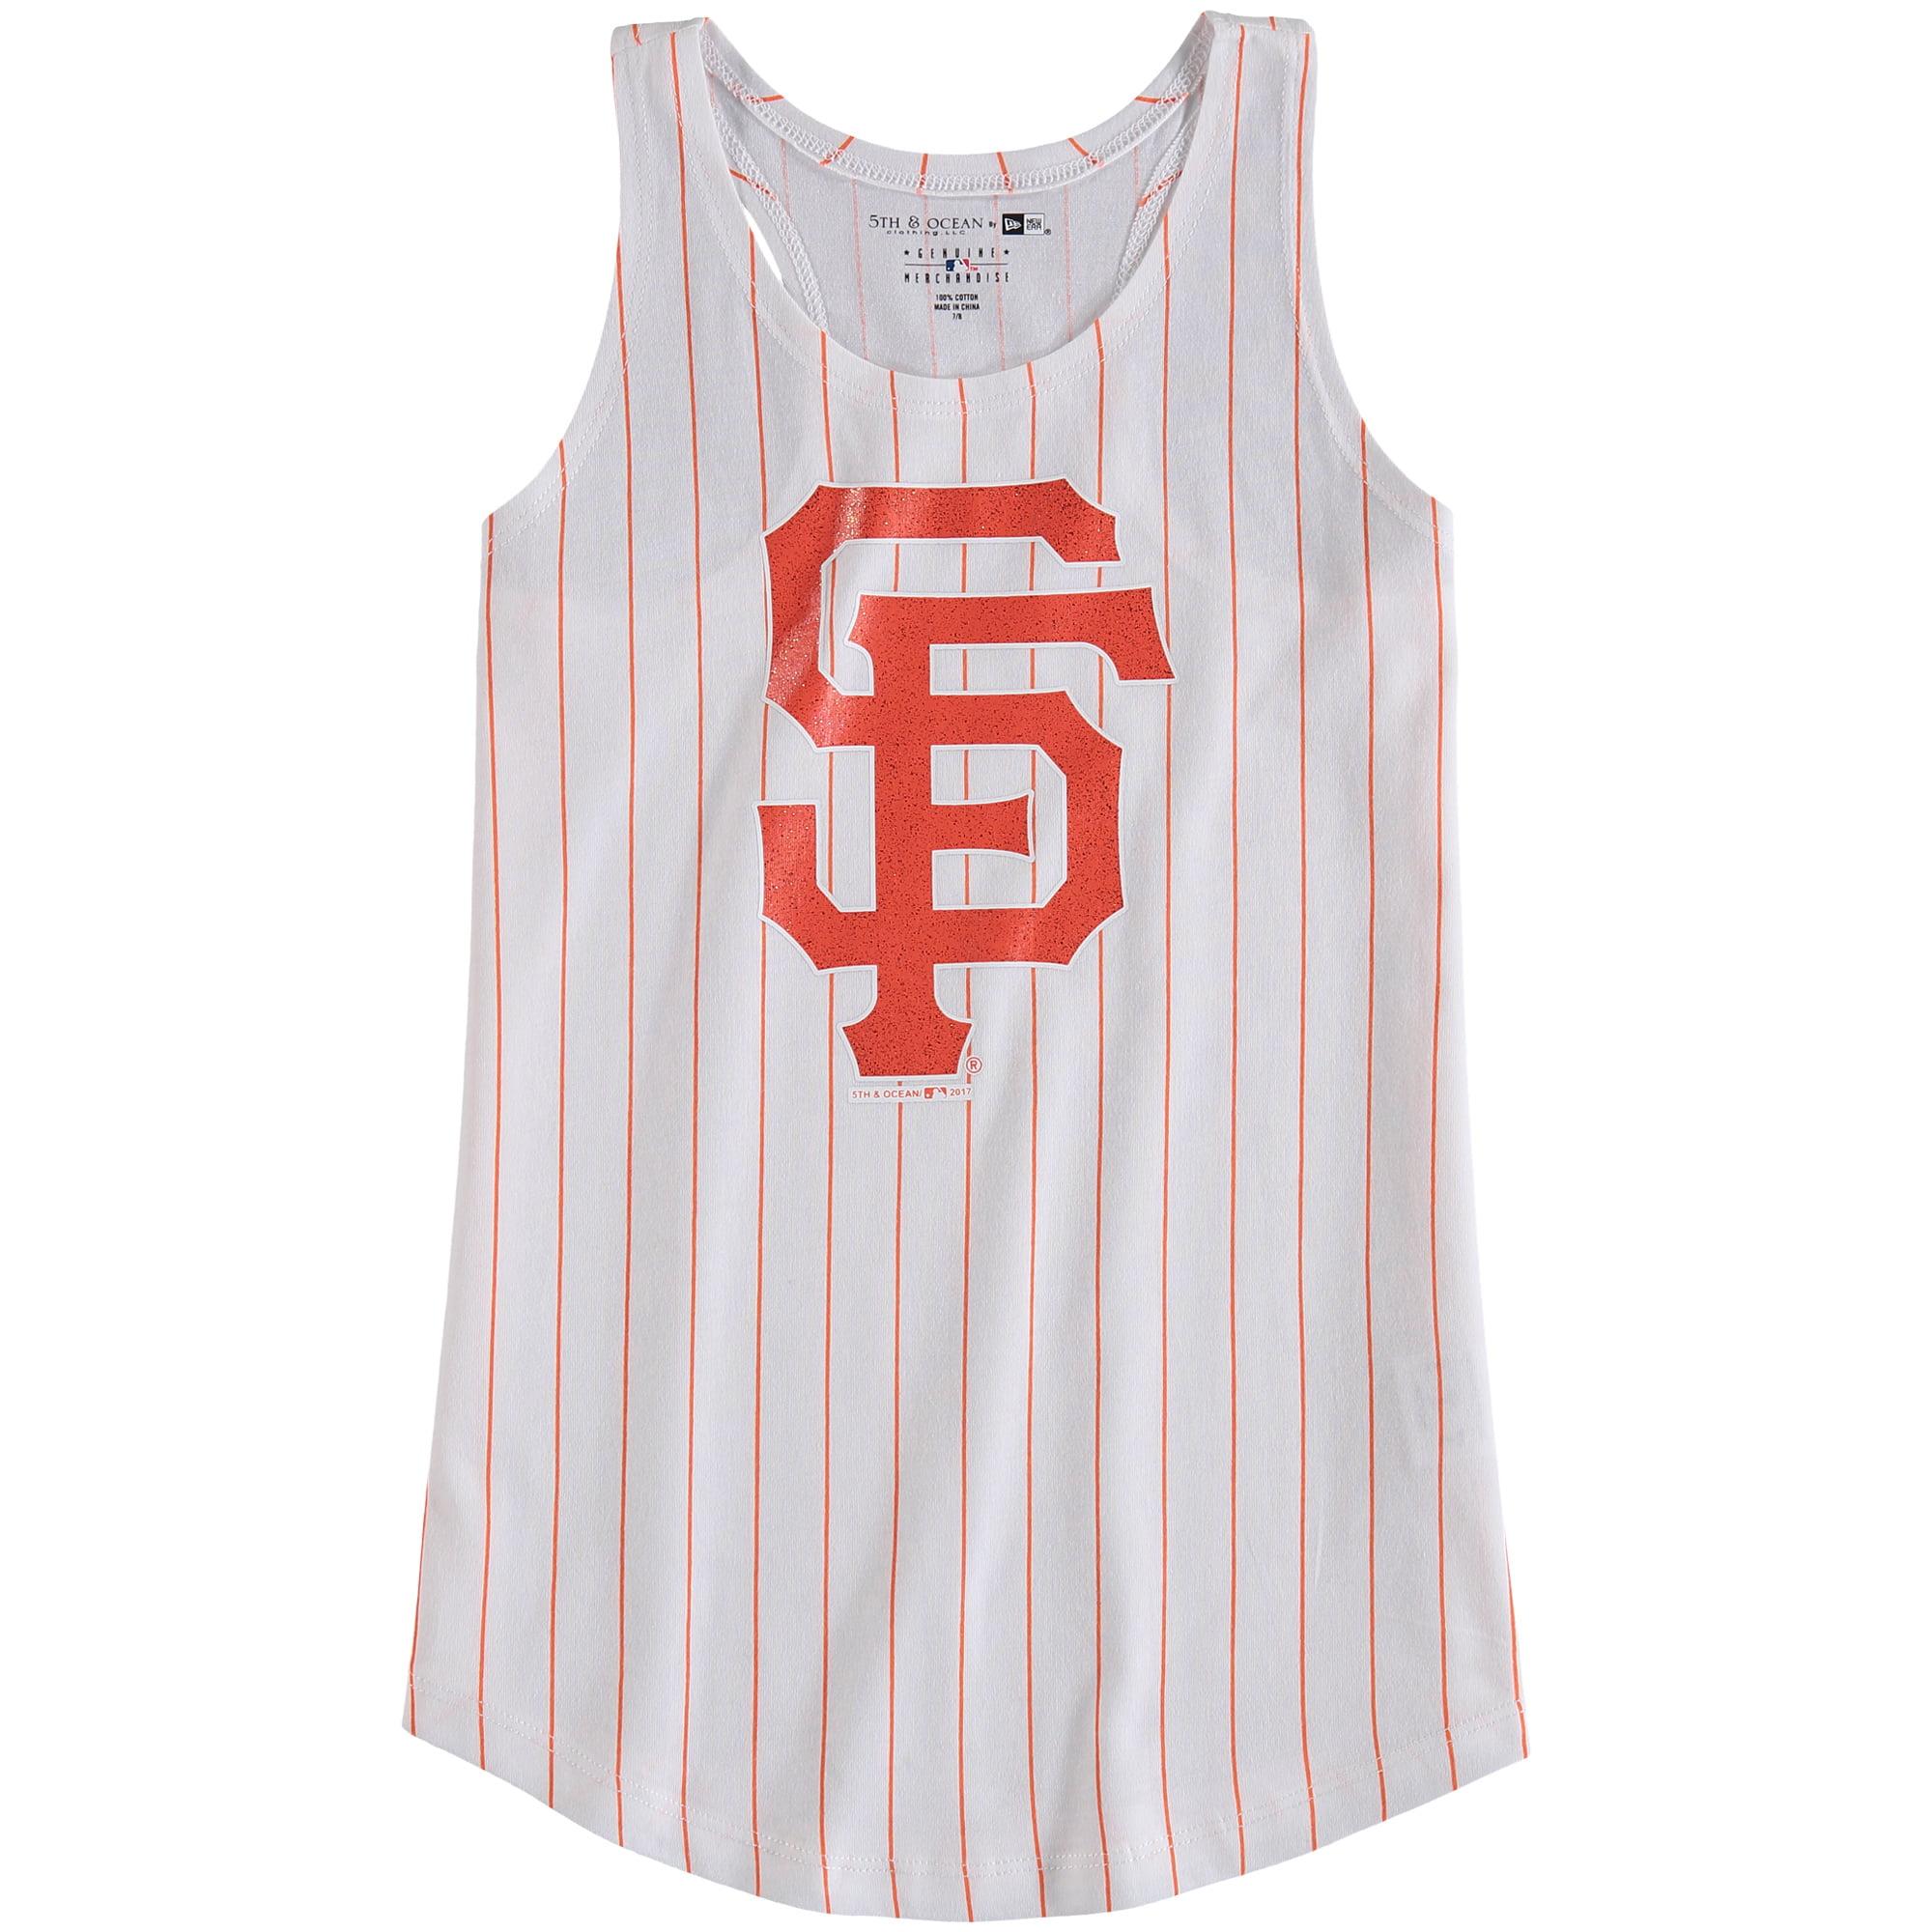 San Francisco Giants 5th & Ocean by New Era Girls Youth Pinstripe Jersey Racerback Tank Top - White/Orange